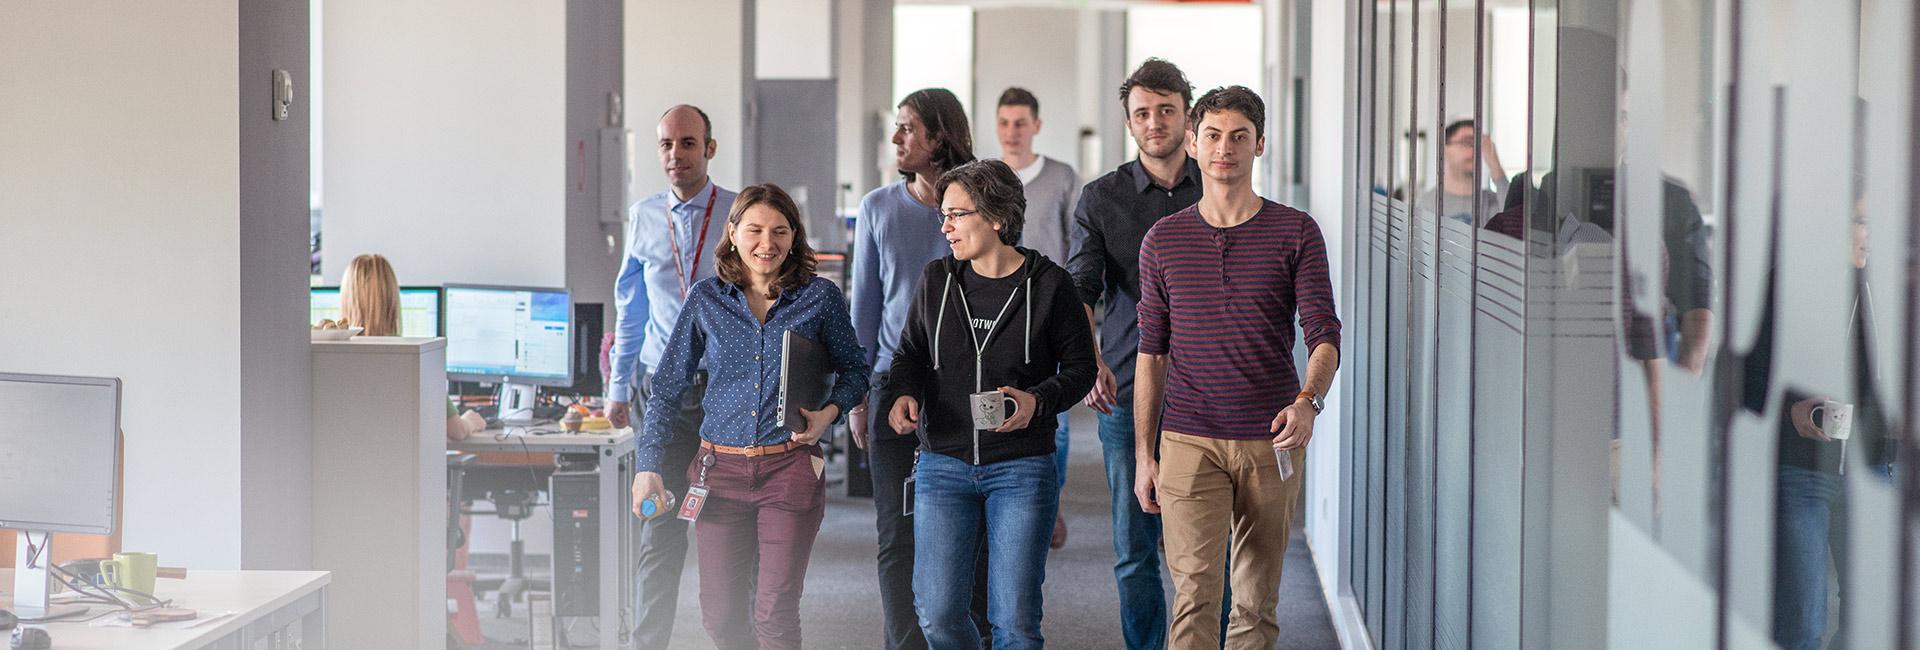 Endava devine un jucator IT global prin fuziunea cu Velocity Partners